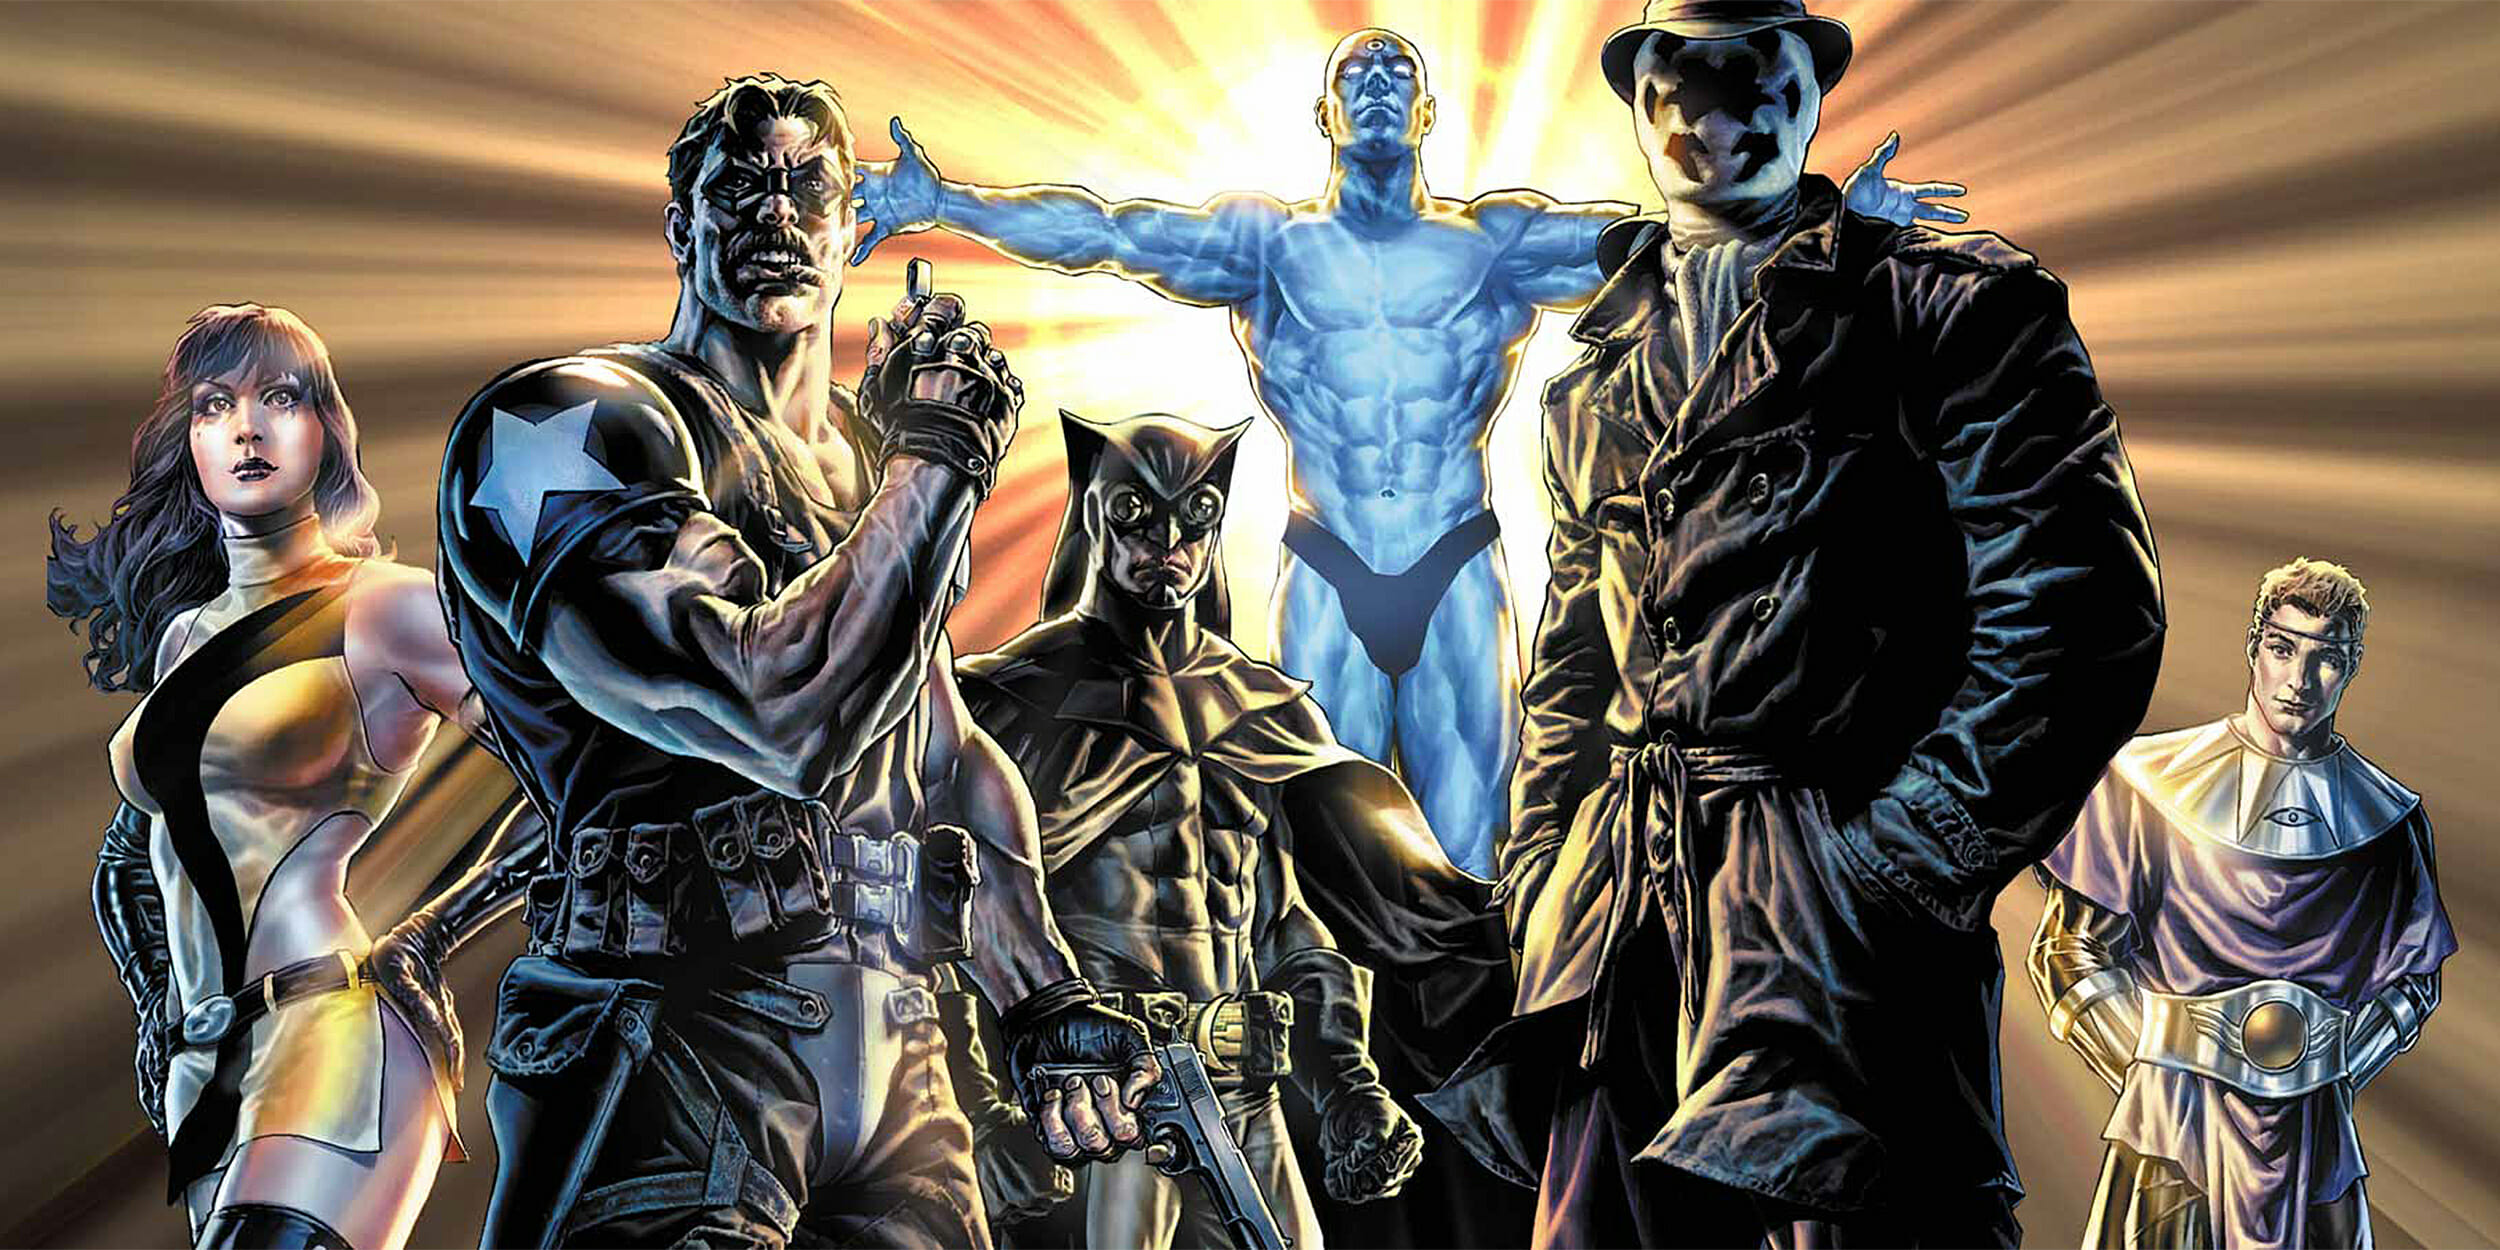 HBO's Watchmen: pubblicati due nuovi misteriosi teaser thumbnail